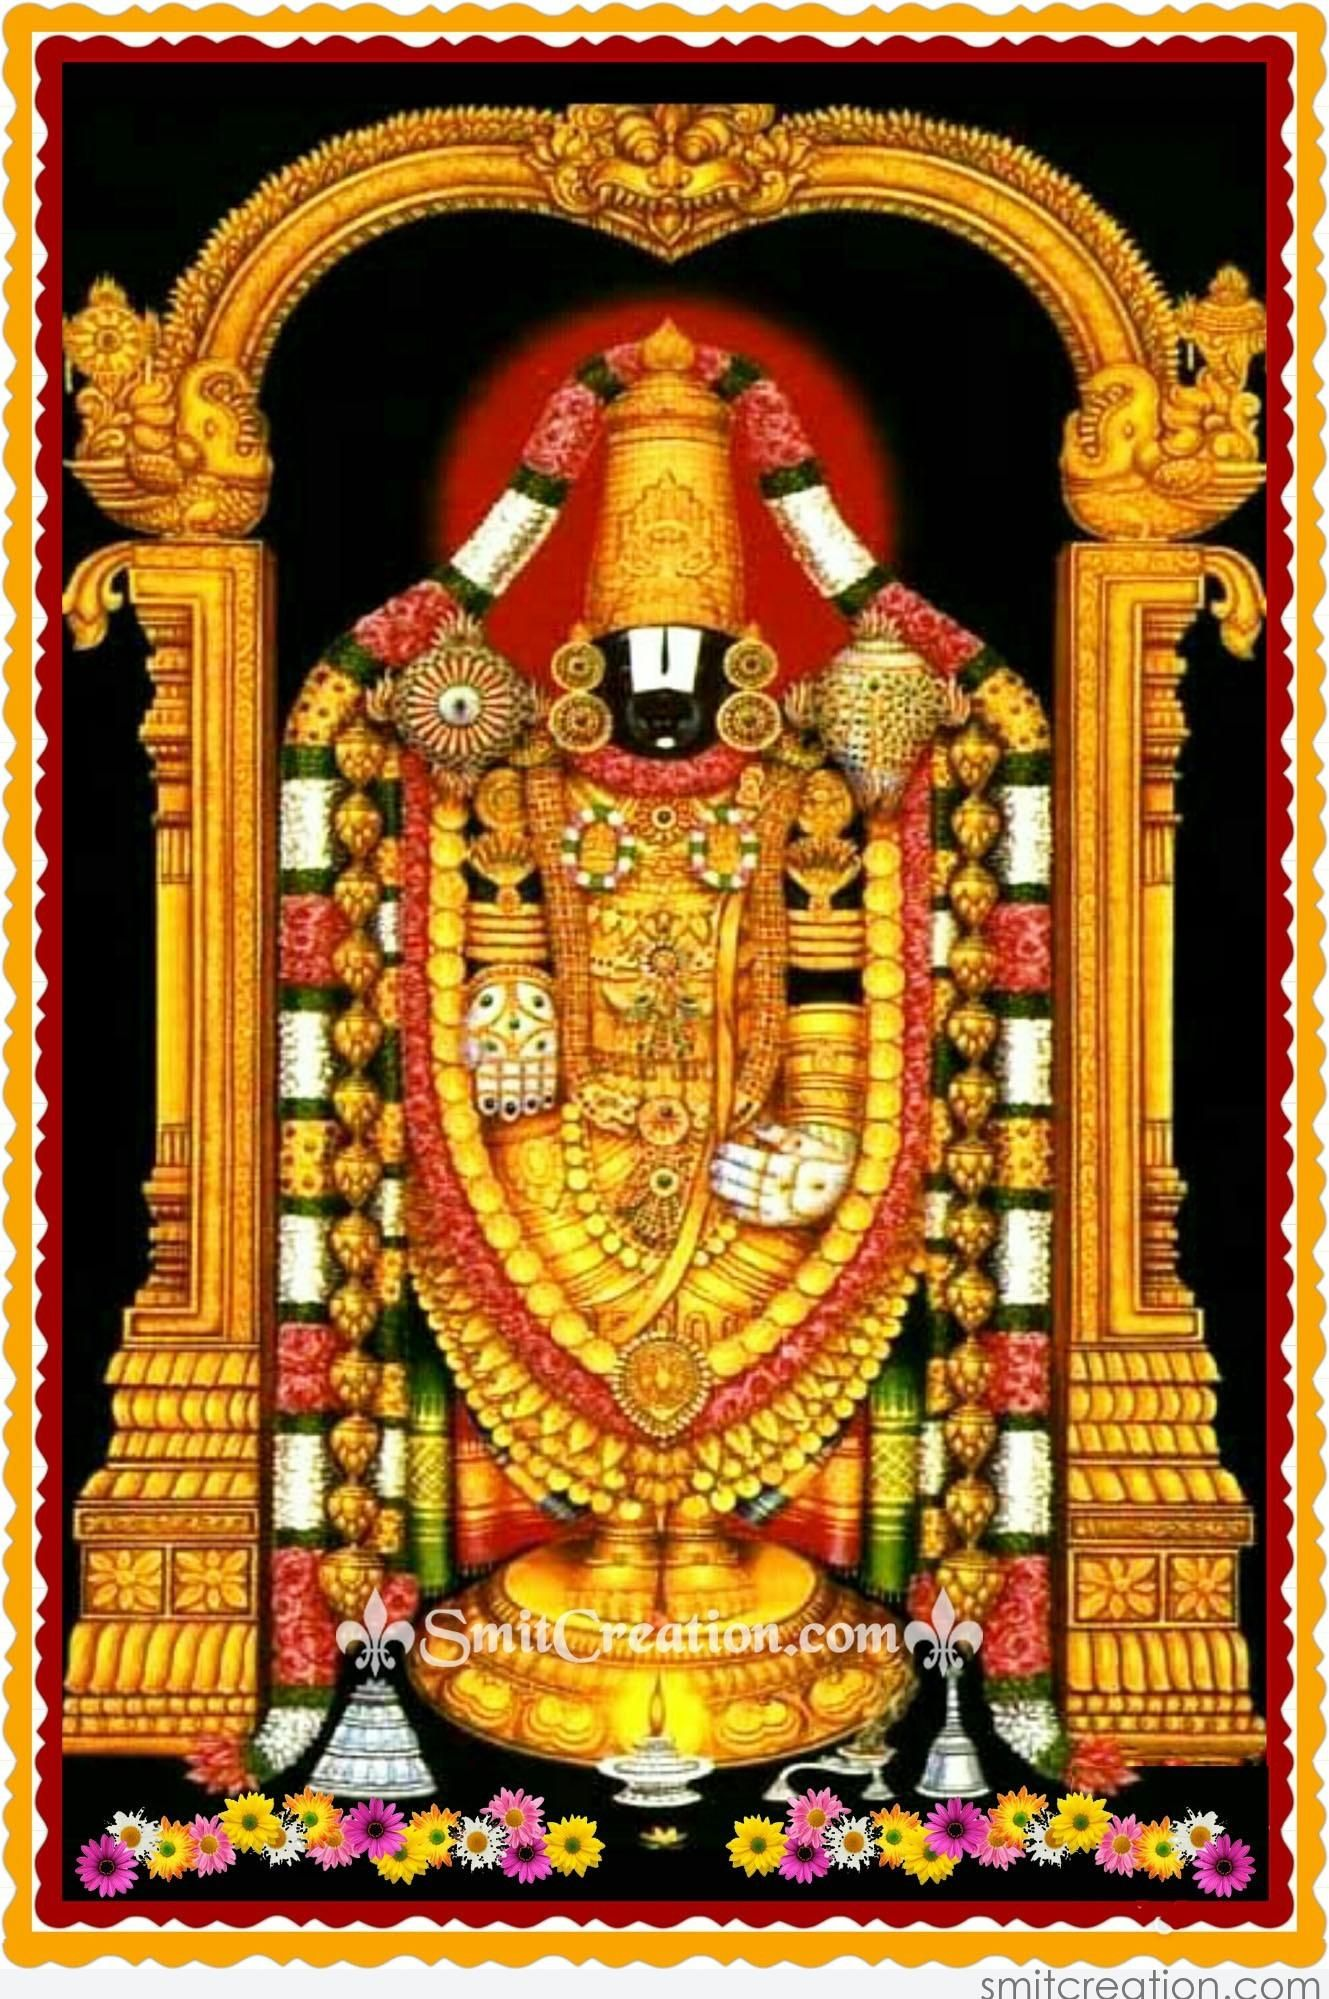 Venkateswara Swamy Photos Free Download Lord Vishnu Wallpapers Lord Balaji Lord Shiva Family Balaji images hd wallpaper free download